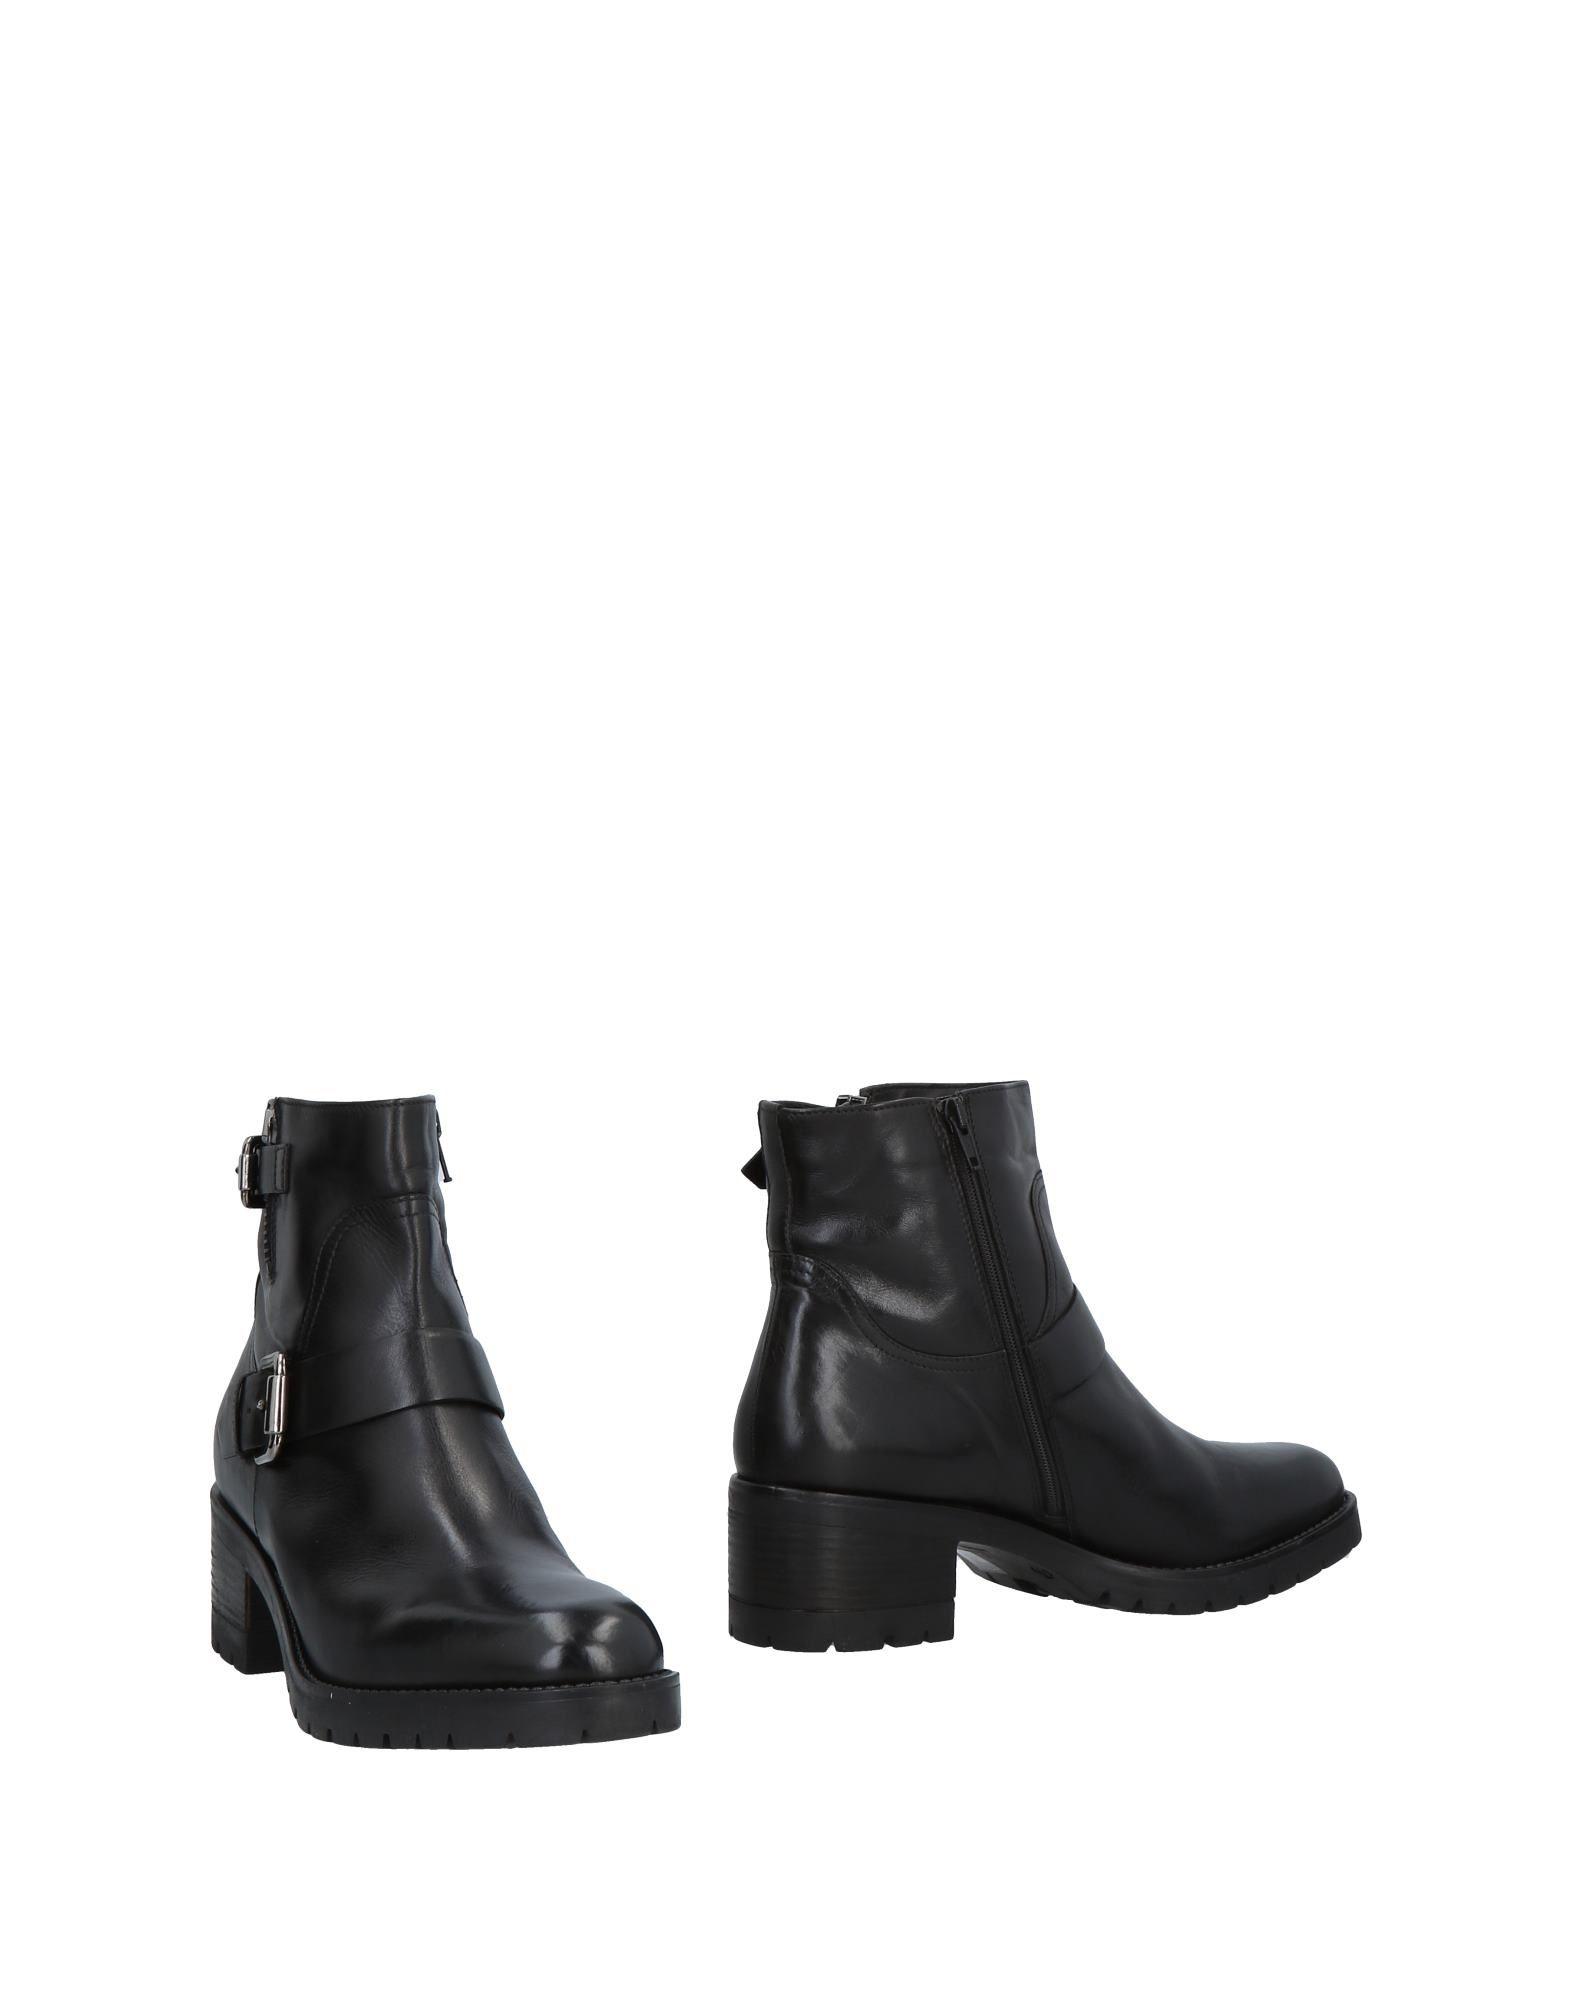 Carmens Stiefelette Damen  11492963FJ Gute Qualität beliebte Schuhe